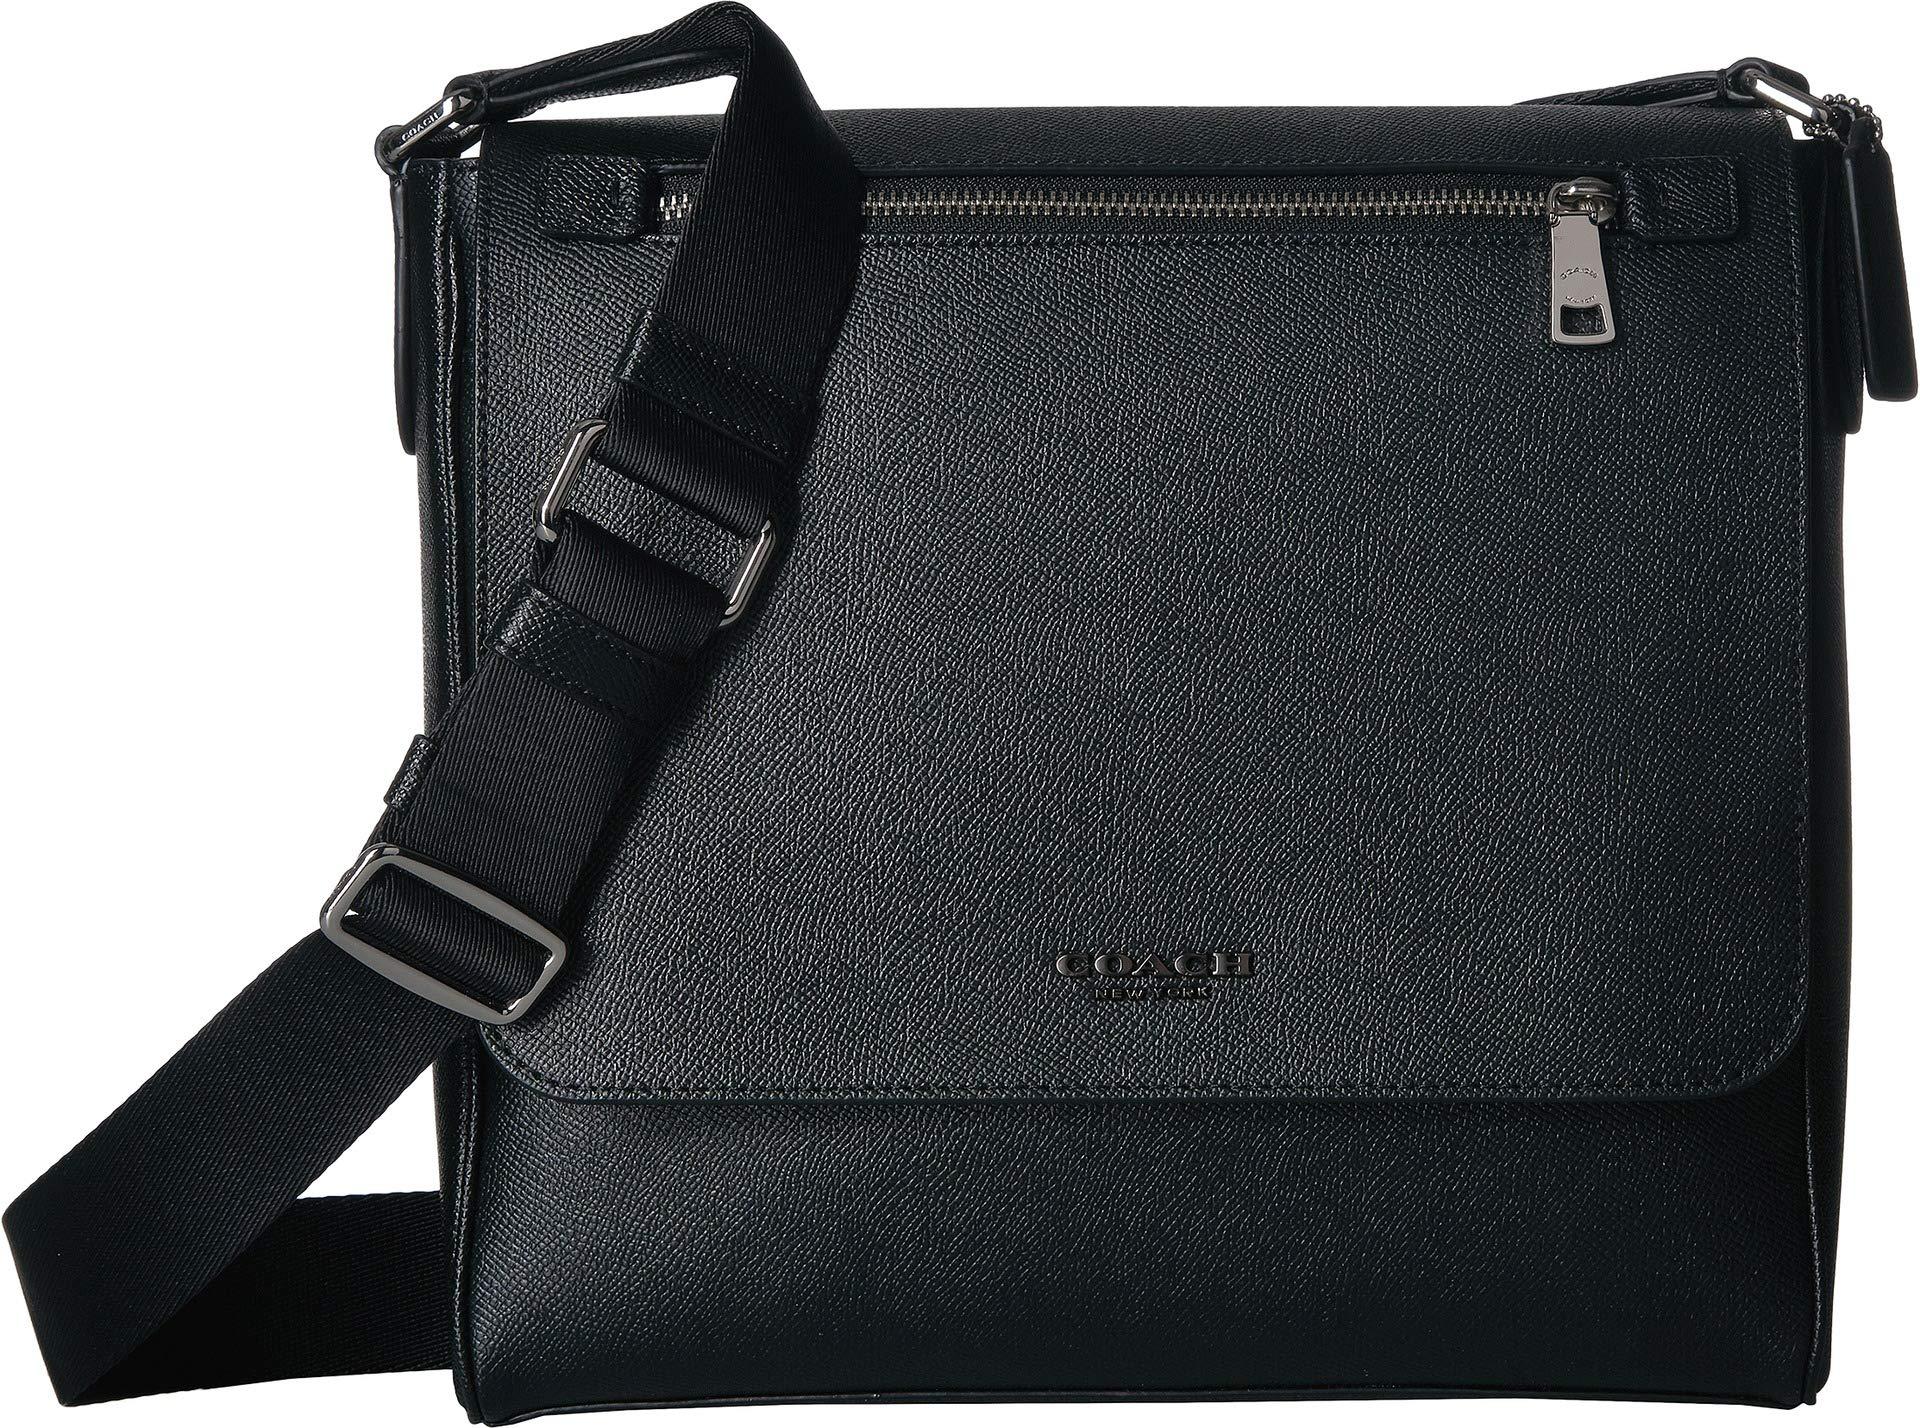 COACH Men's Kennedy Map Bag Sv/Black One Size